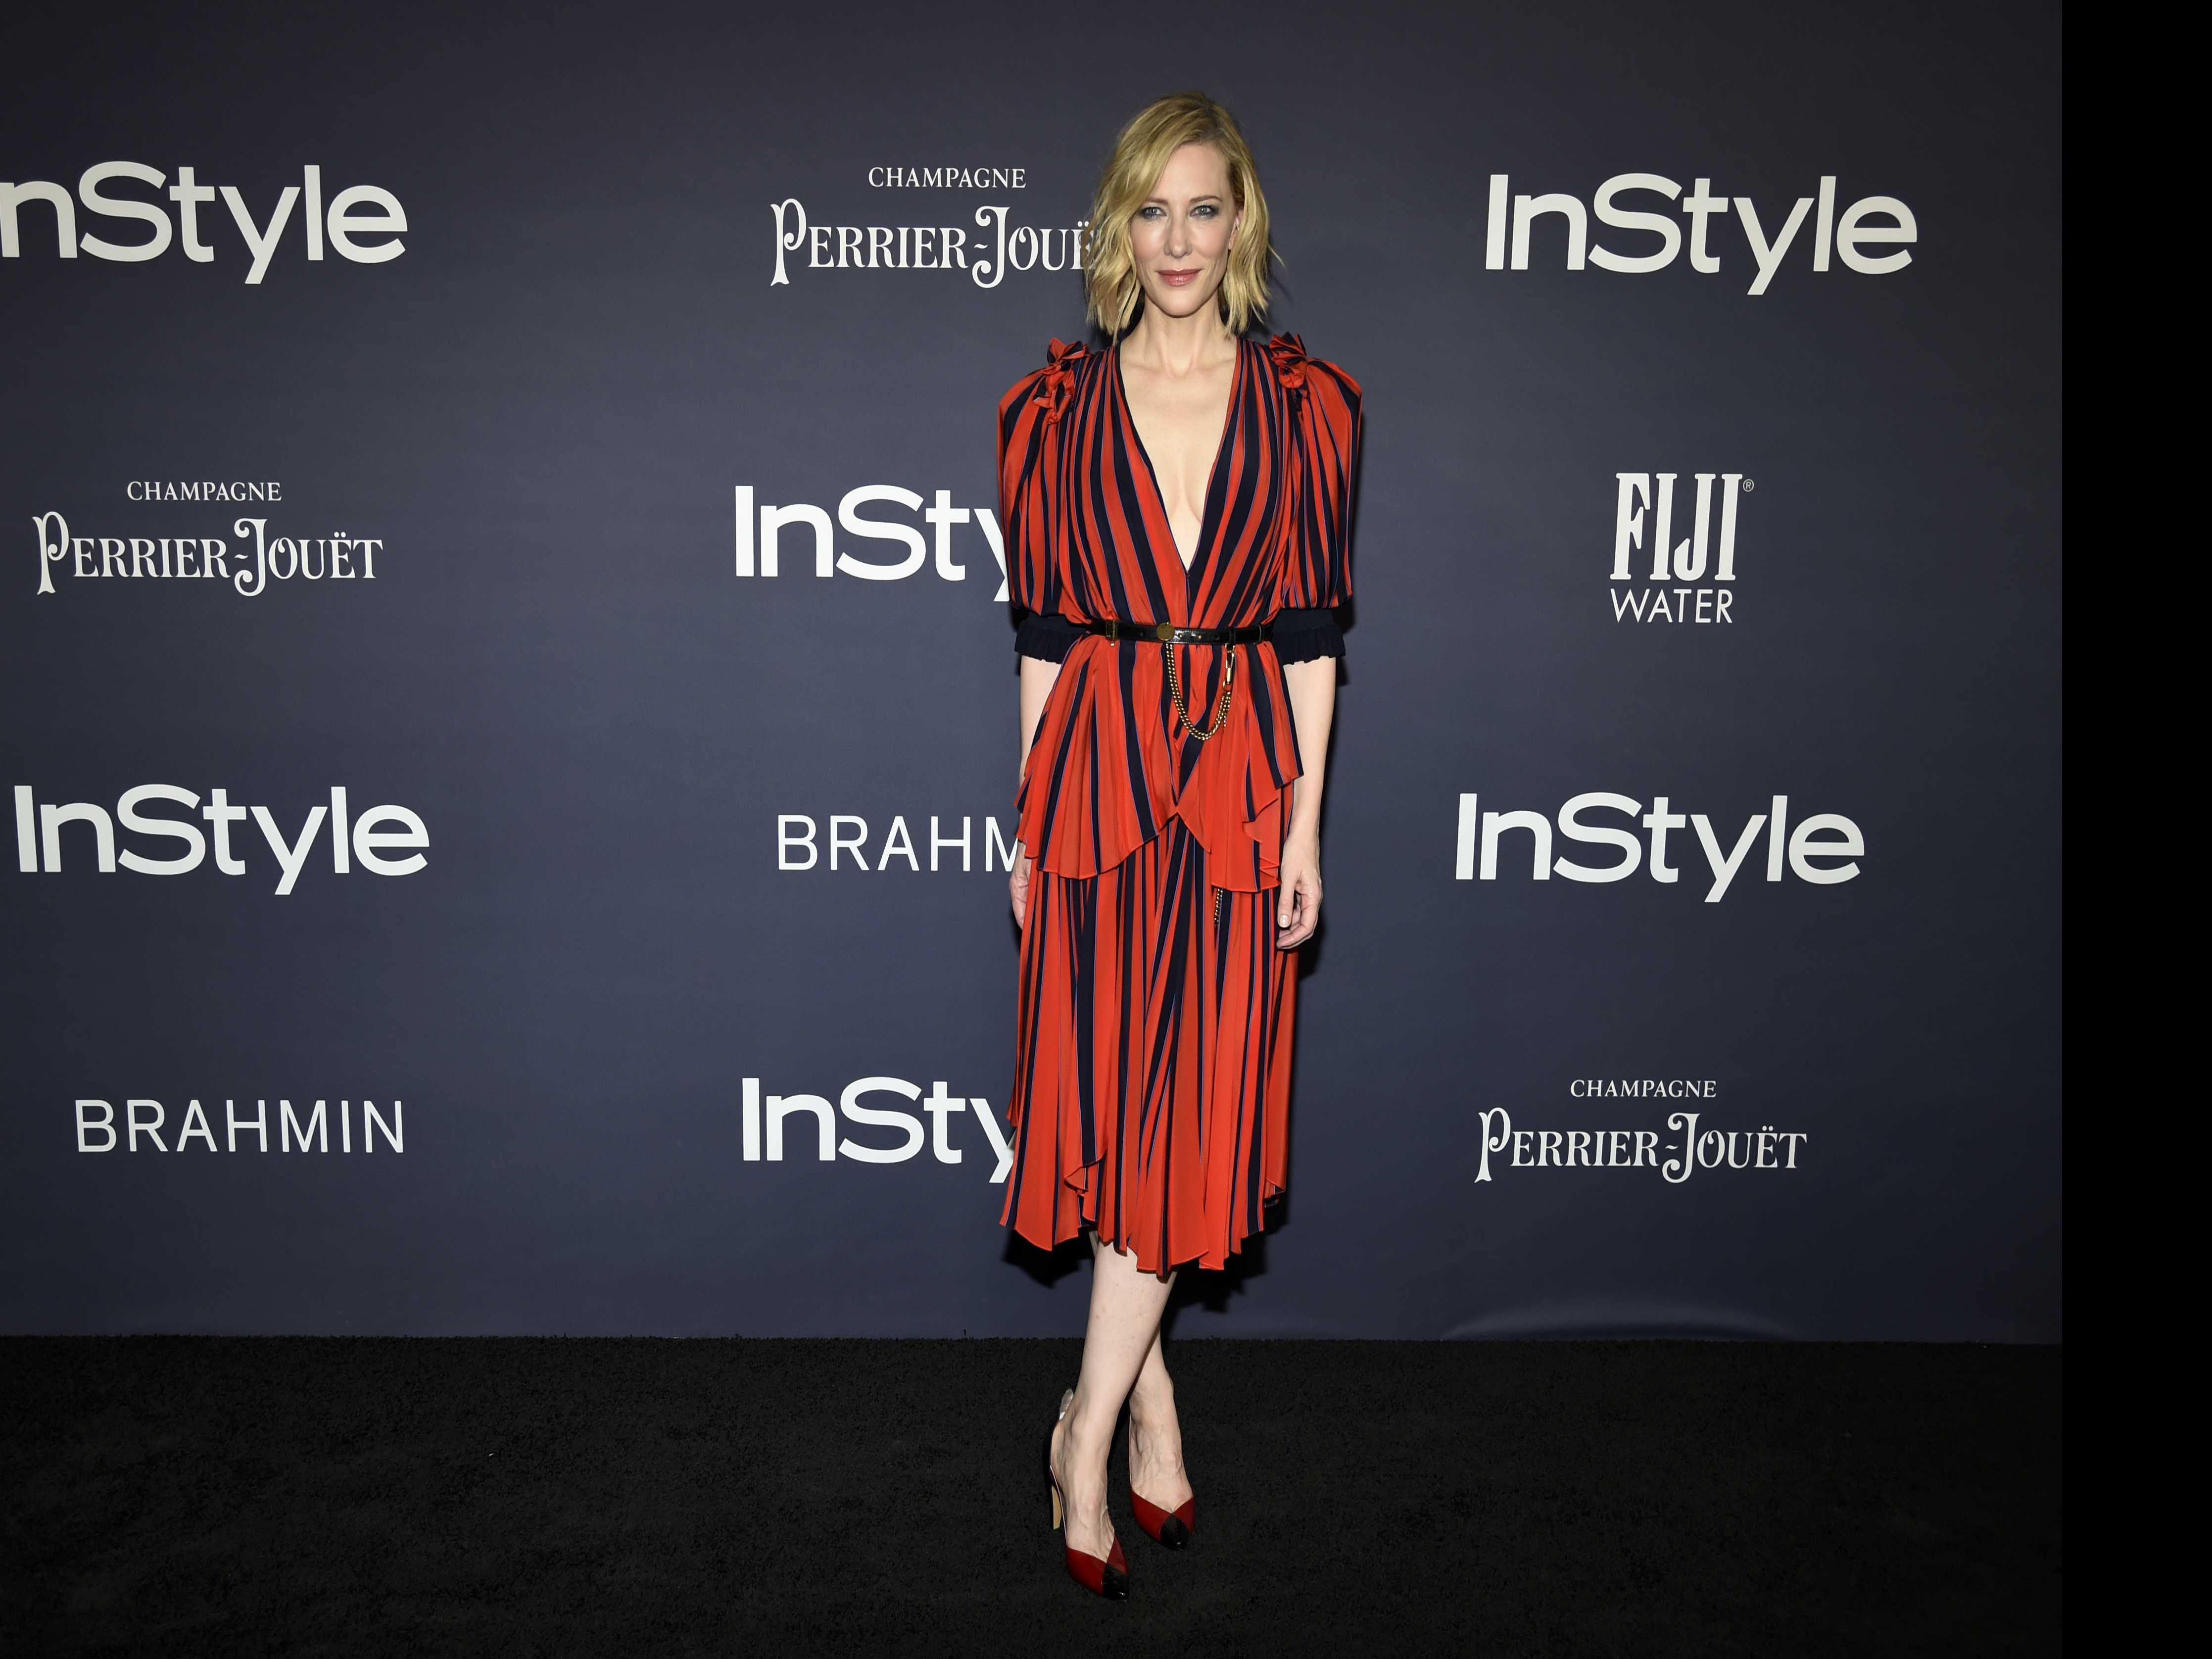 IZendaya, Cate Blanchett Preach Empowerment at InStyle Awards